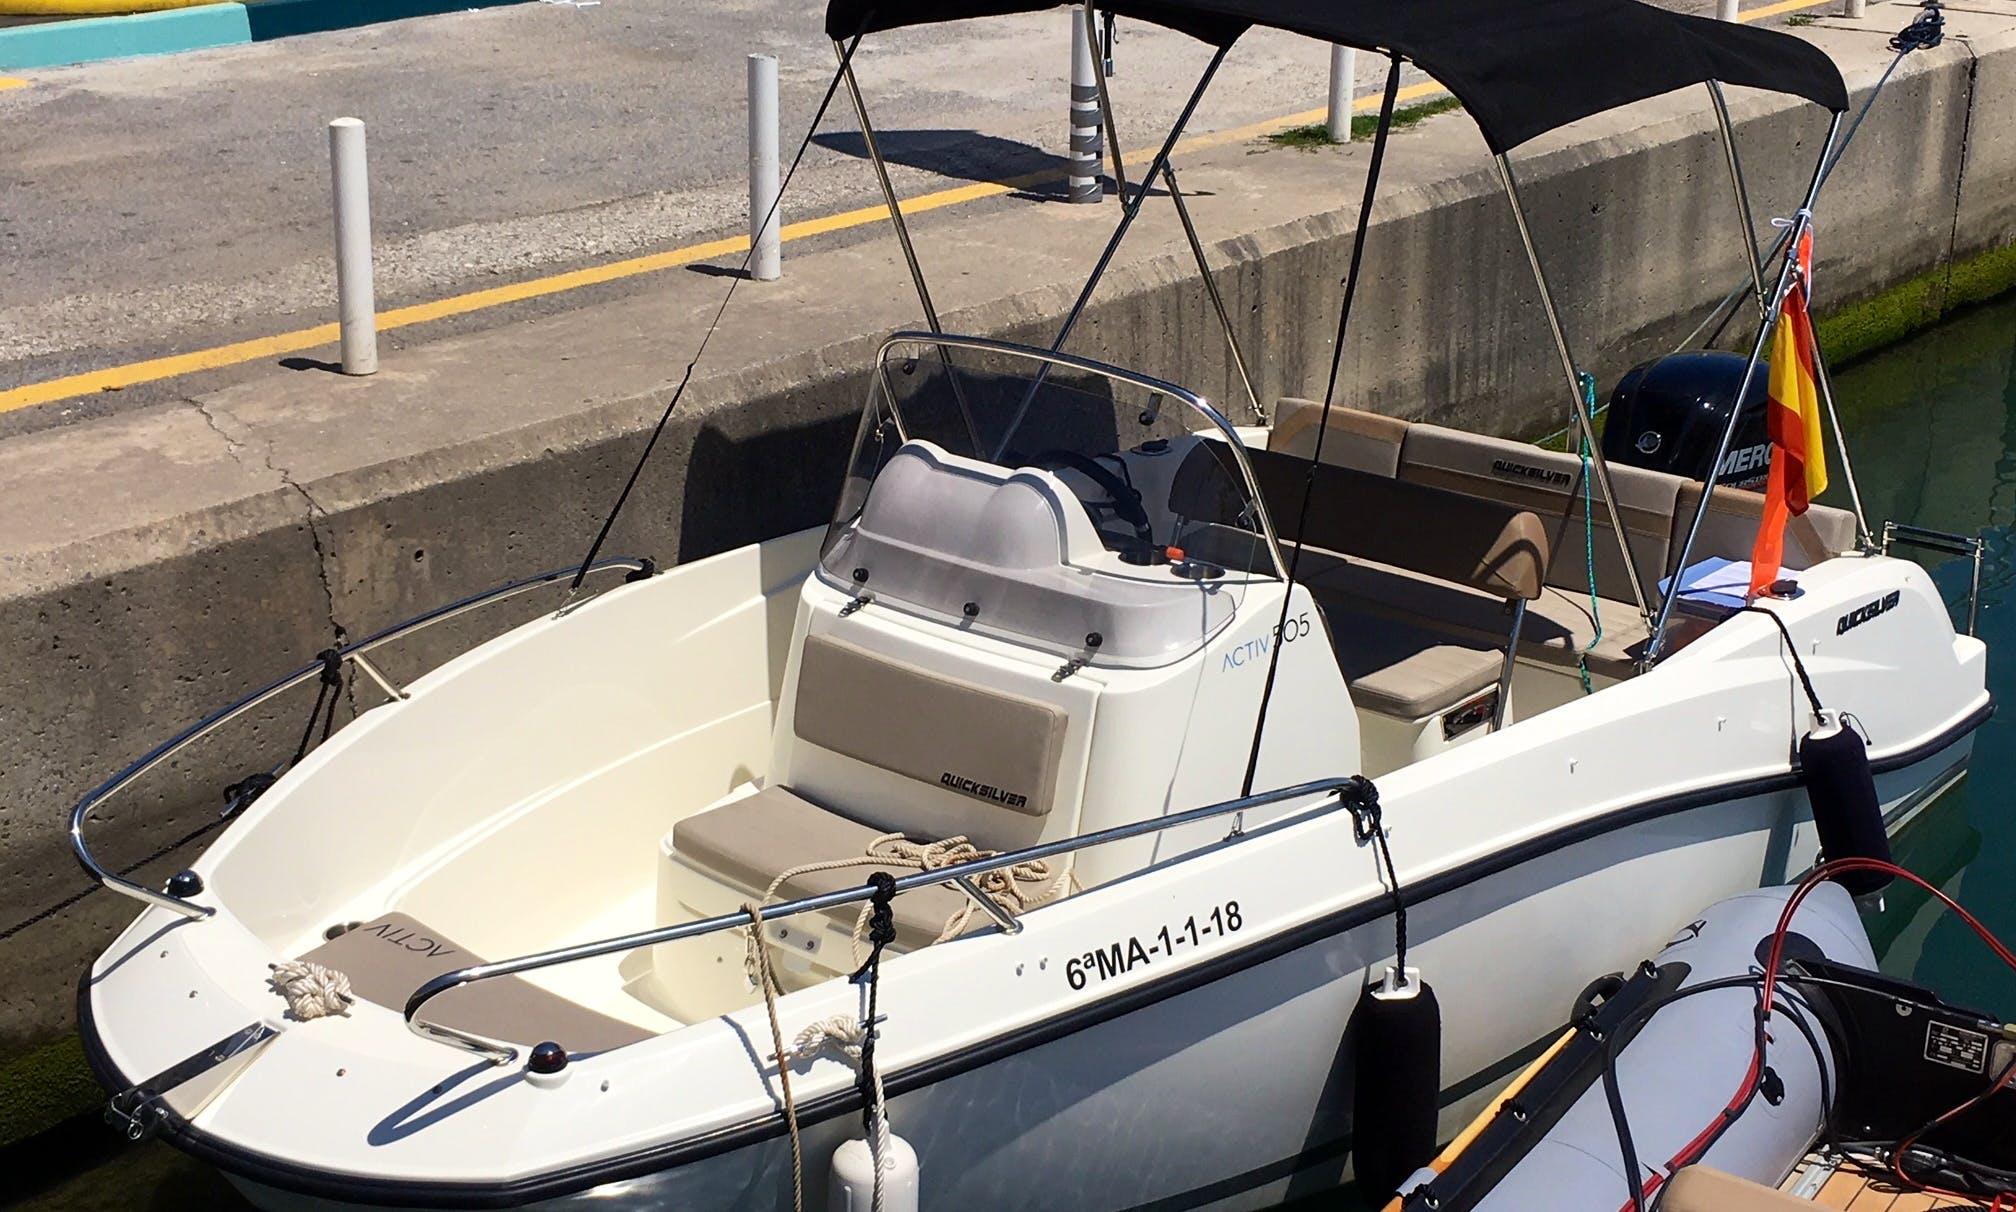 Deck Boat rental in Benalmádena